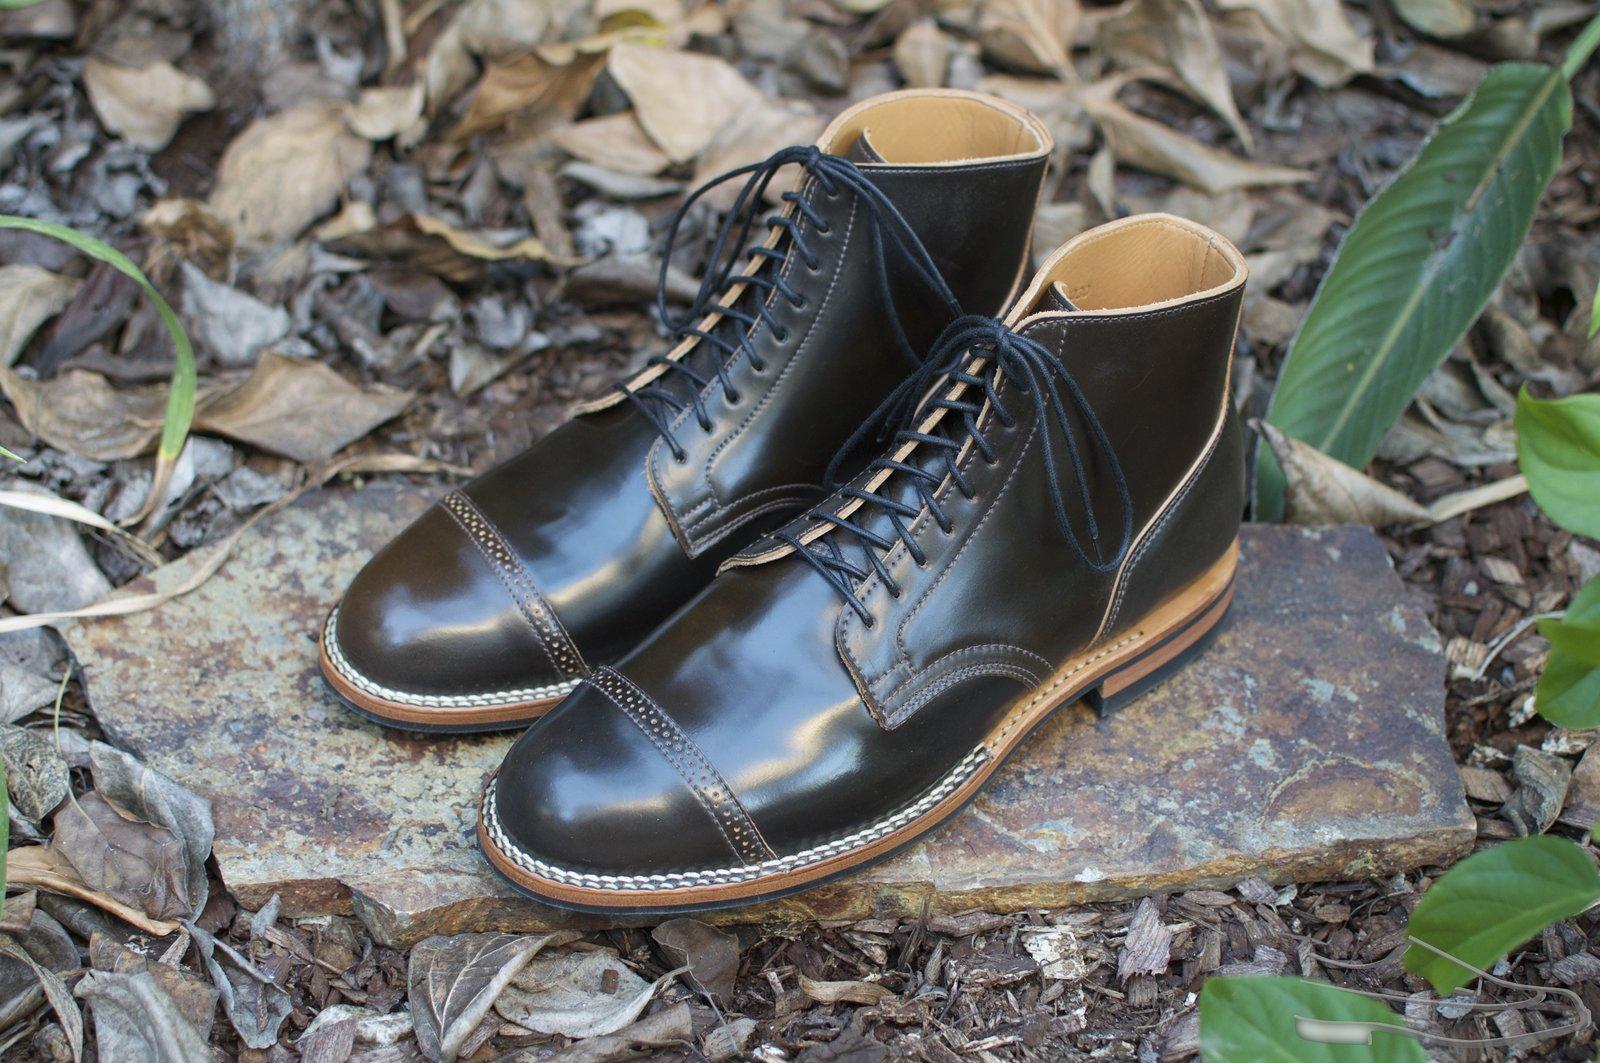 Viberg Dark Cognac Shell Cordovan Service Boots - 2020-10-30 - 1.jpg